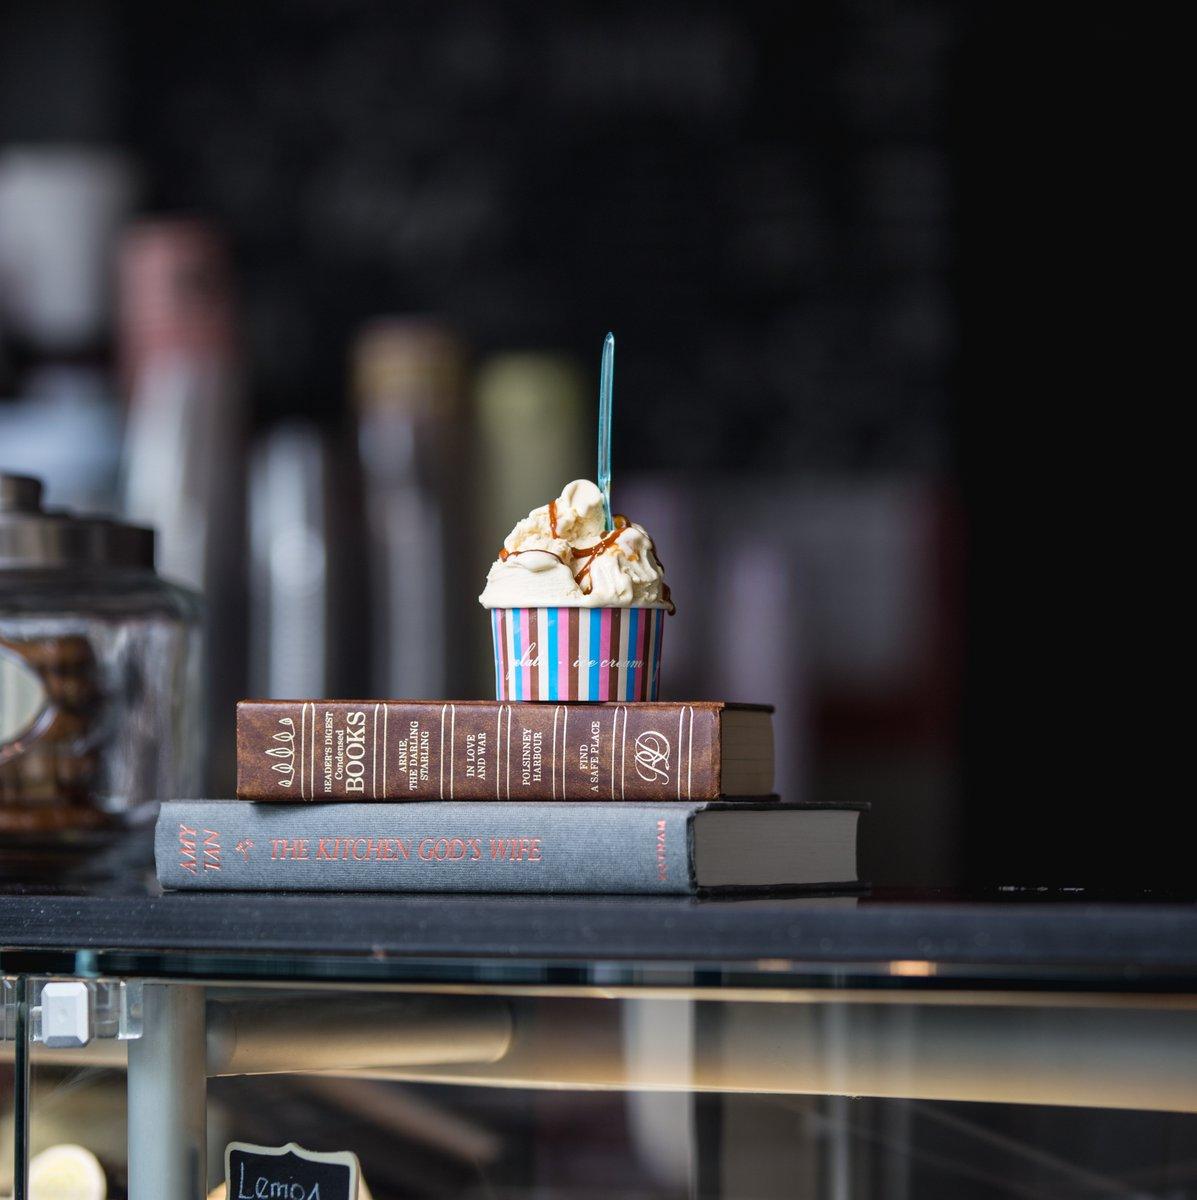  Who's always craving gelato? Because I know we are!  Visit us at 550 Queens Quay to try the best gelato in town! ♡  #touticafe #gelato #gelateria #nomnom #delicious #instagood #instafood #treat #gelatospot #dessert #torontoeats #eatingfortheinsta #foodforthegram pic.twitter.com/Jd46tEoJV8